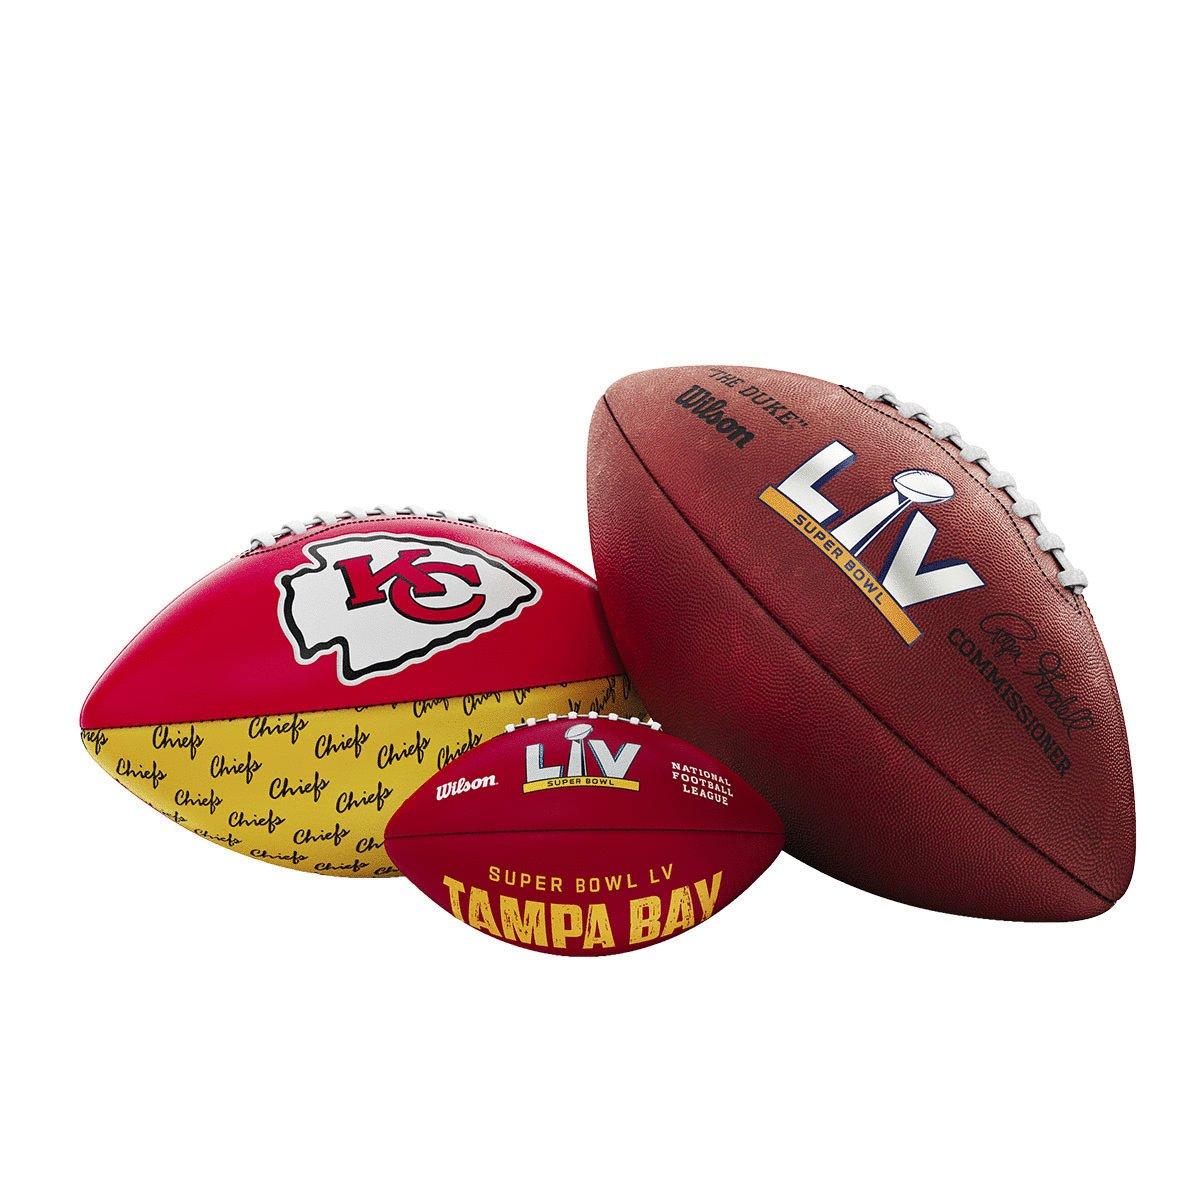 🚨 Super Bowl Bundle Drop! 🚨   Which one would you cop? 🧐 #wilsonfootball #sblv #chiefskingdom #gobucs  ➡️: